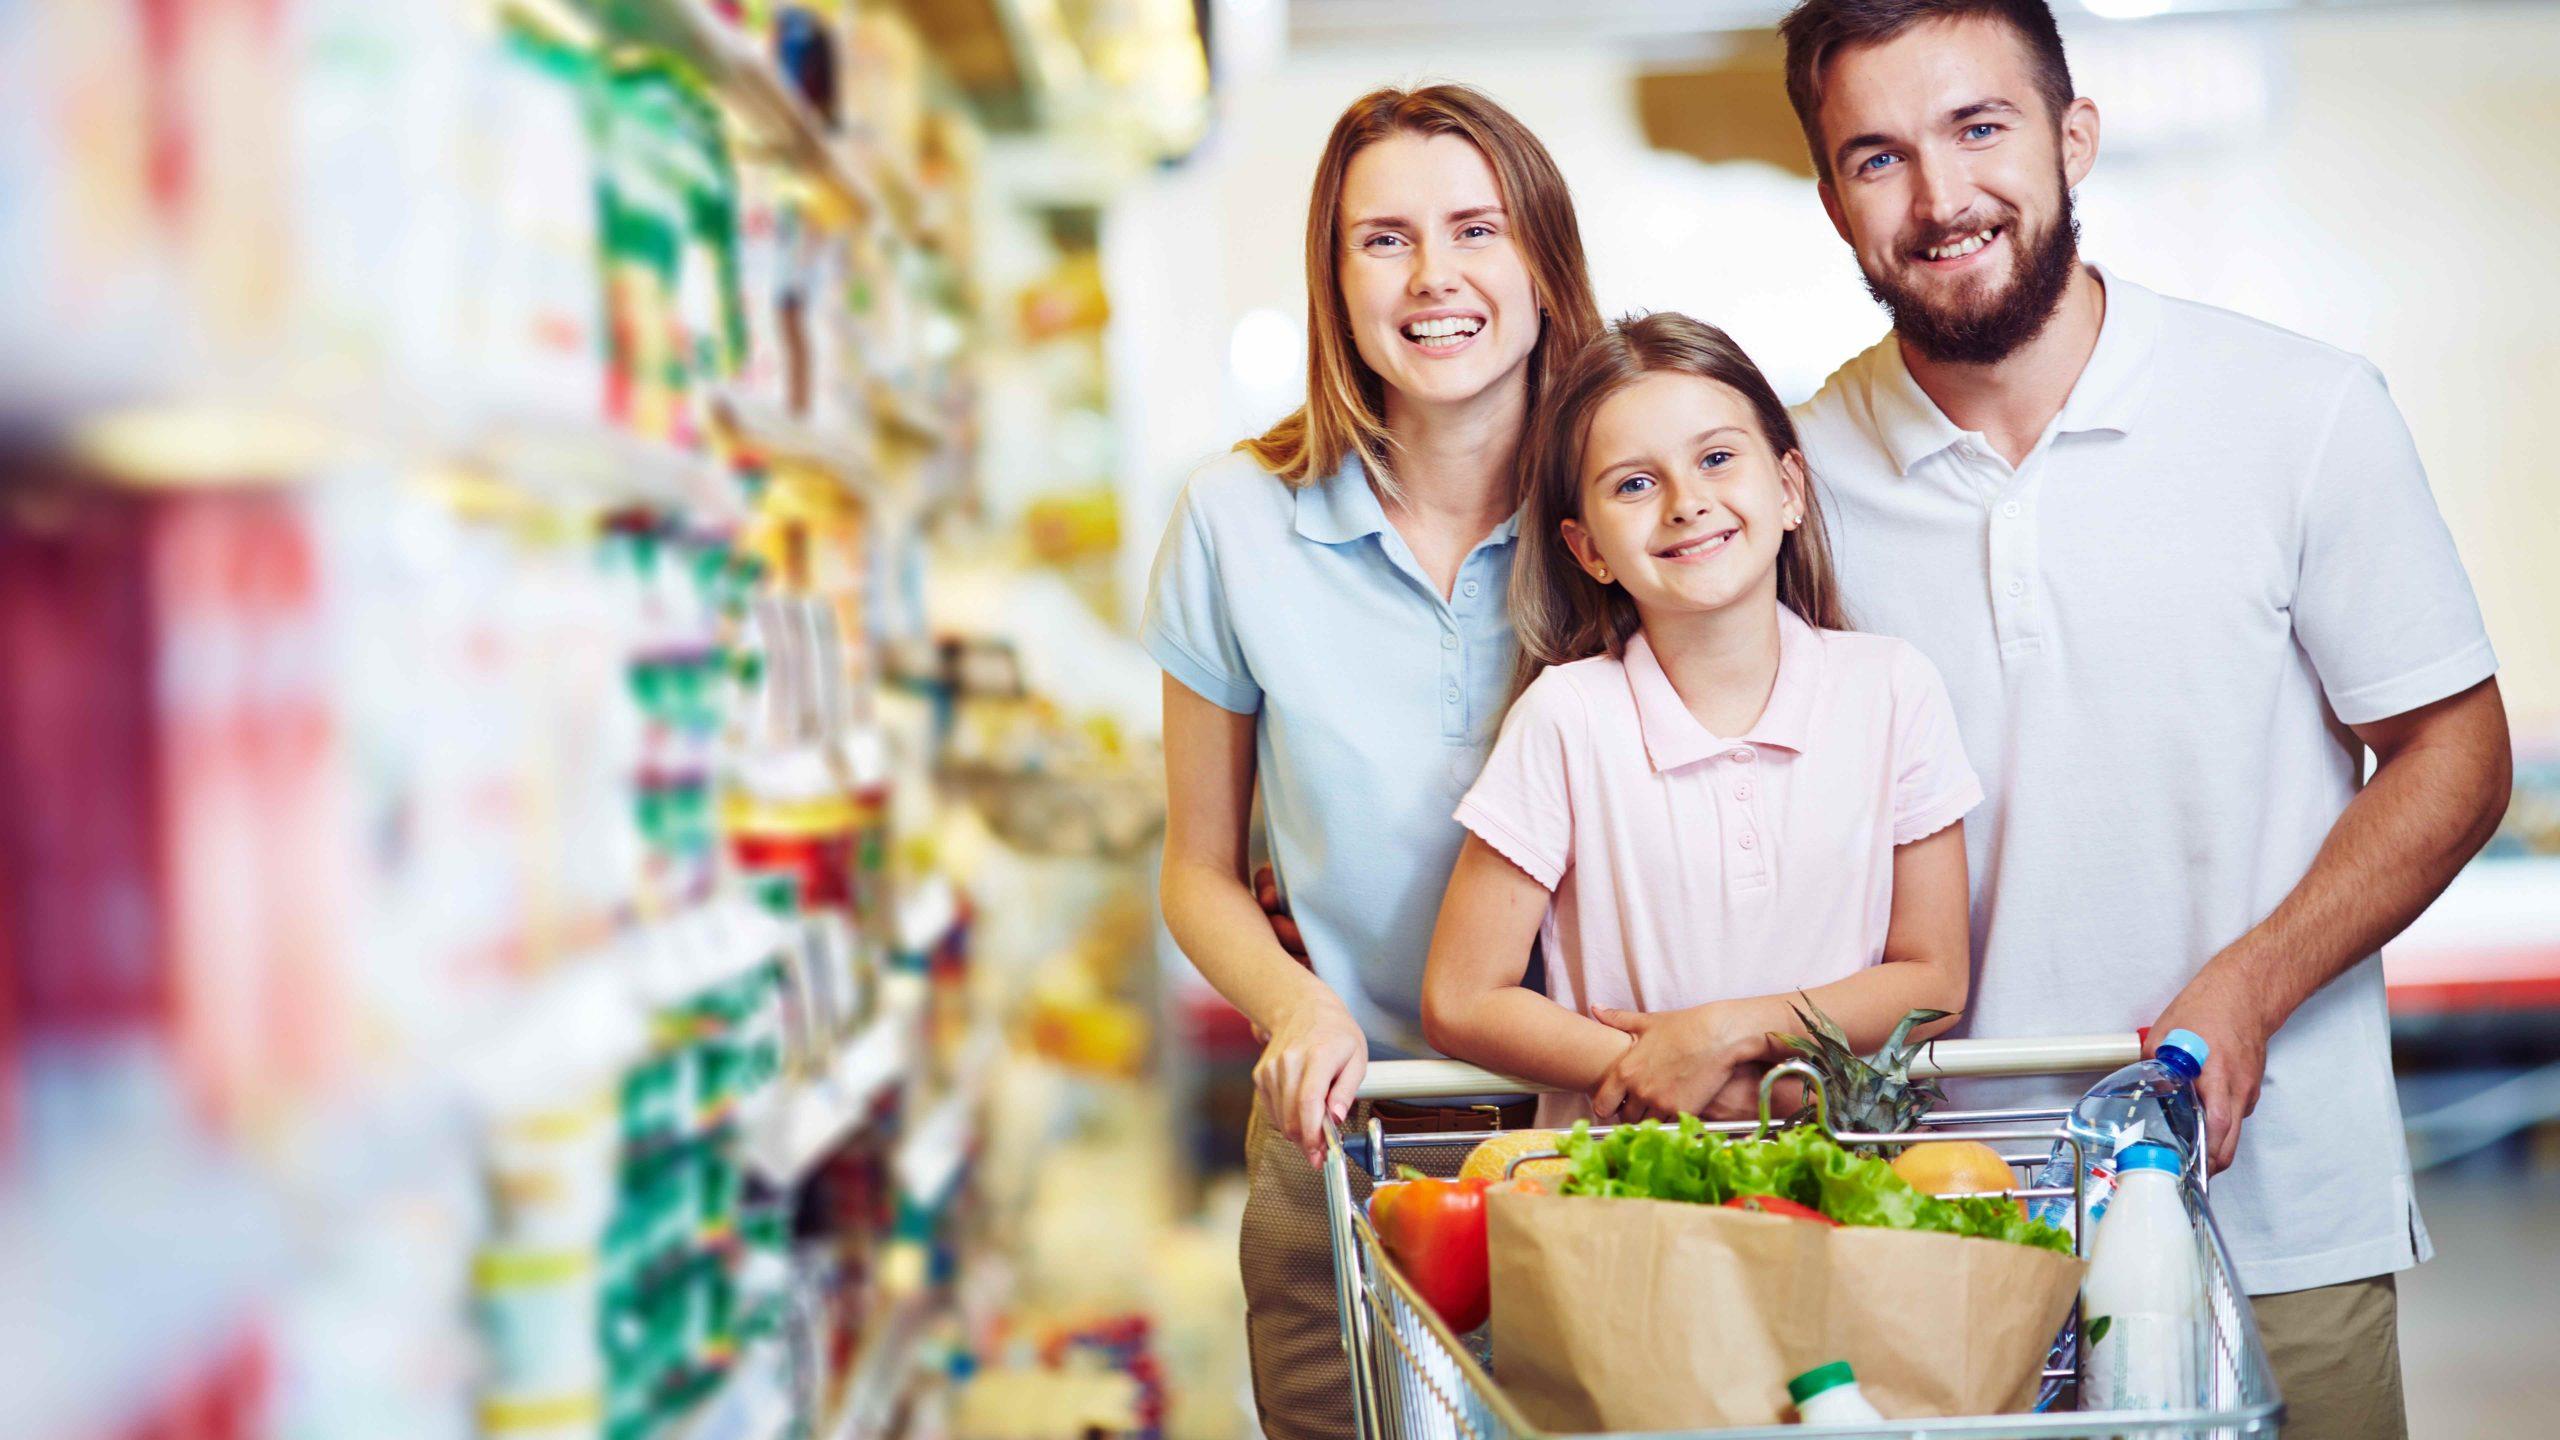 Supermercados en Aranjuez